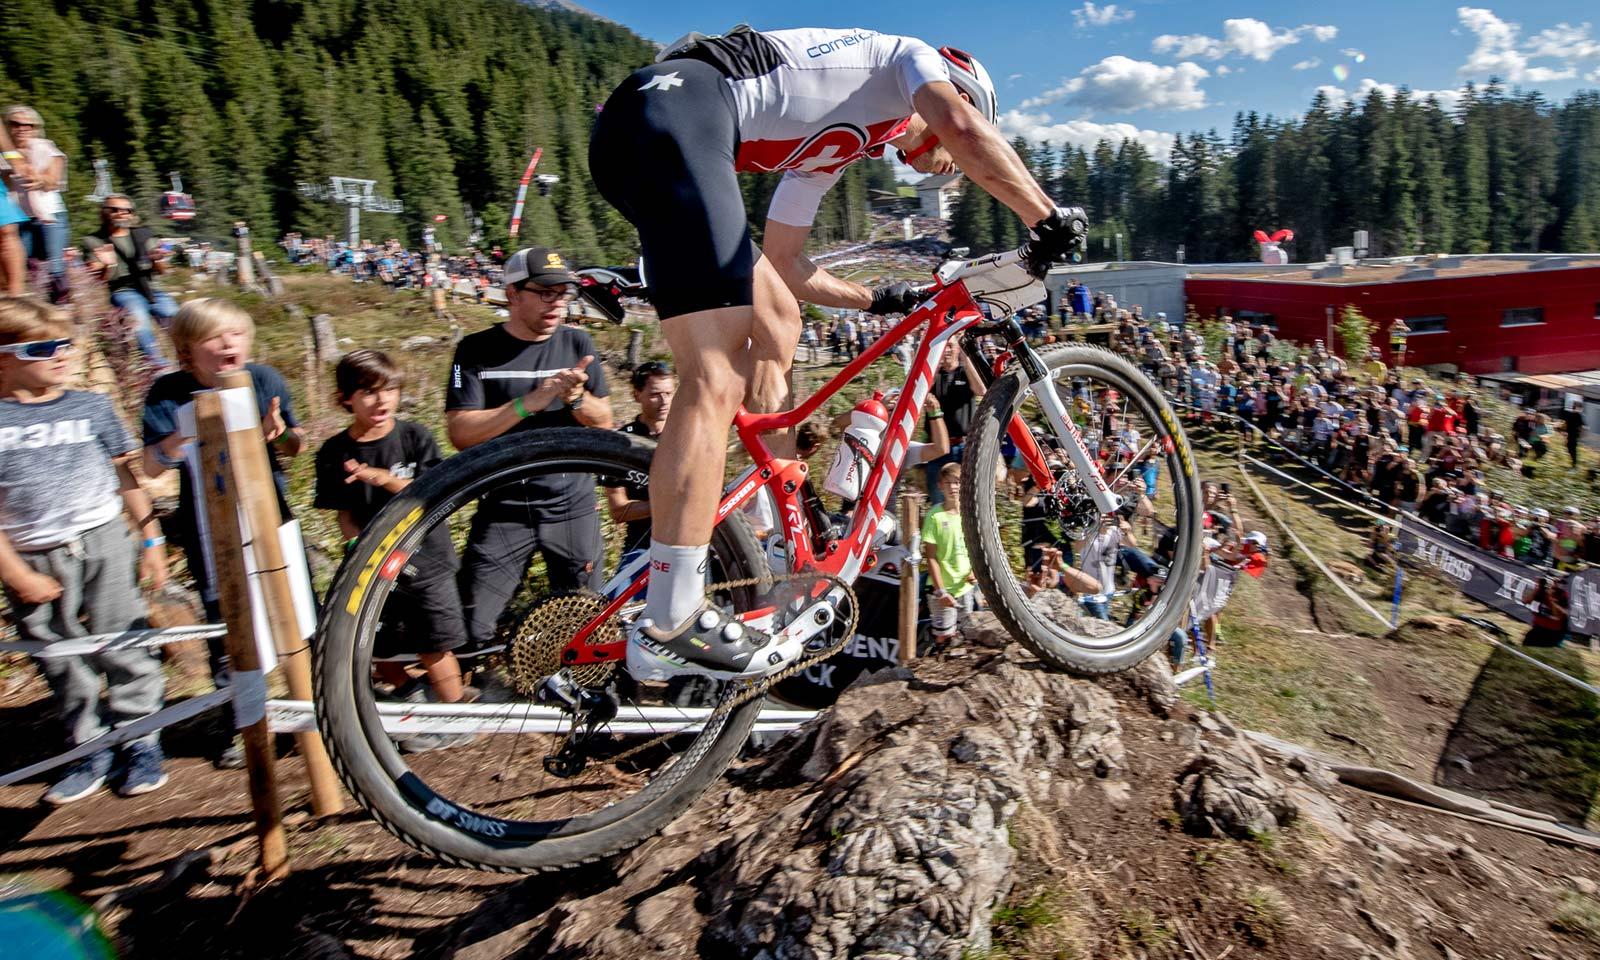 Scott Spark RC 900 World Cup, Nino Schurter - 7x World Champion N1NO 2018 Swiss XC Worlds mountain bike